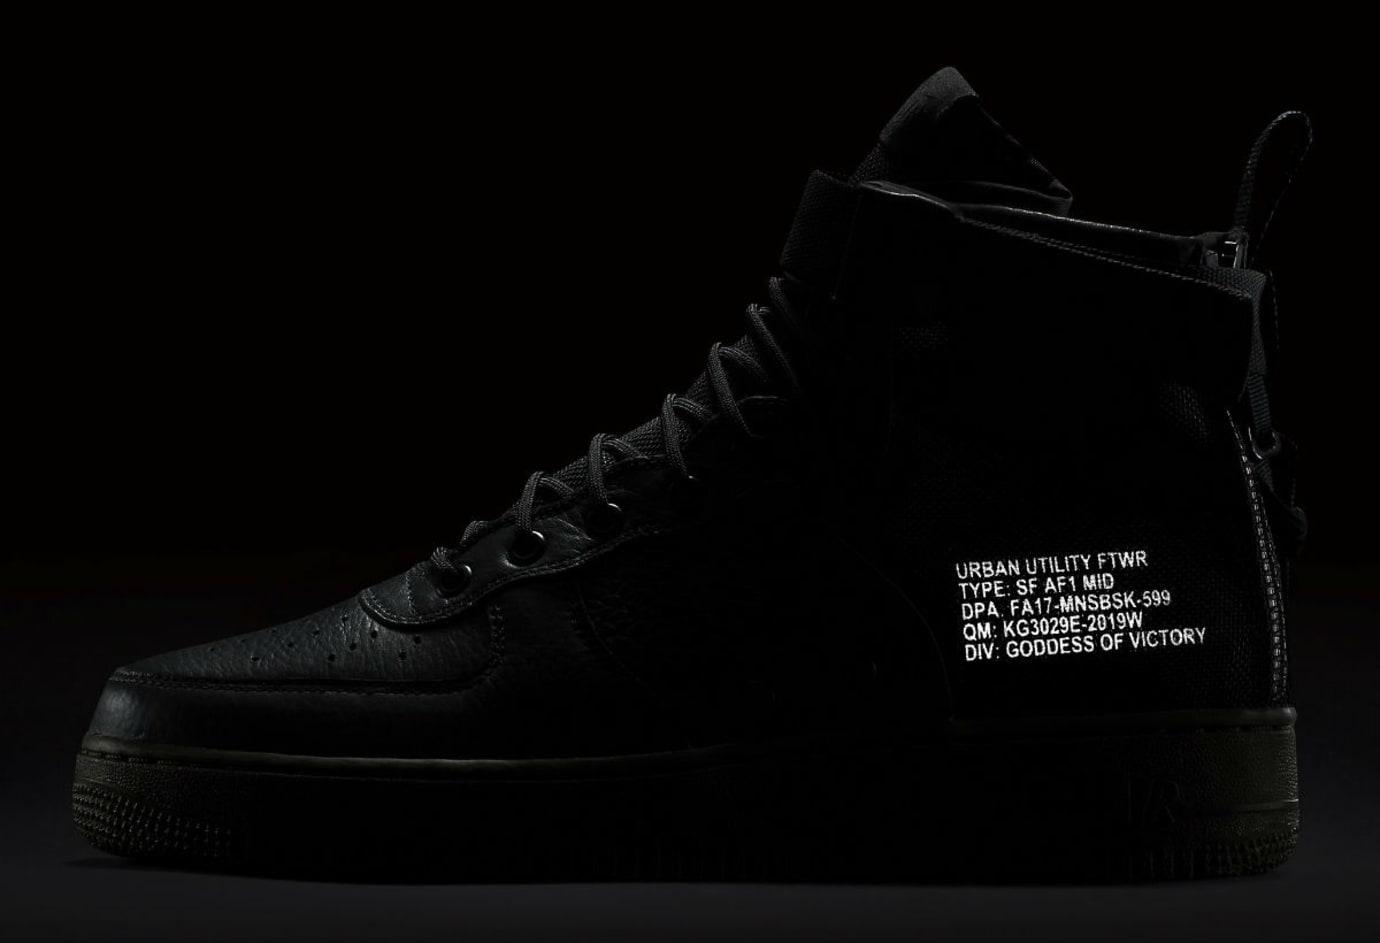 Nike SF Air Force 1 Mid Cargo Khaki Release Date 3M 917753-002